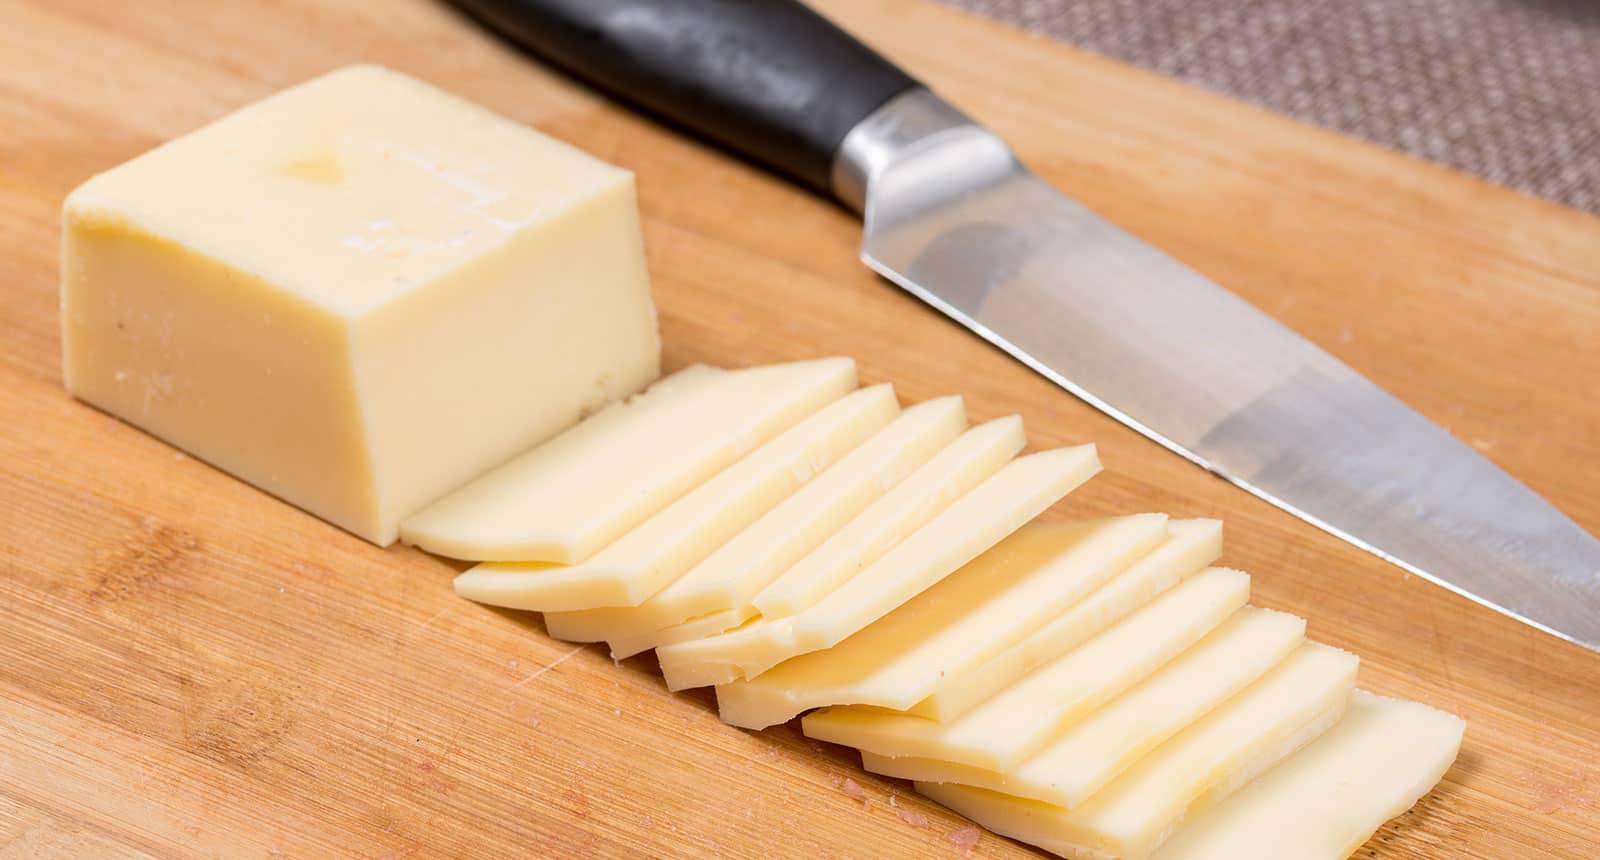 A Utility Knife